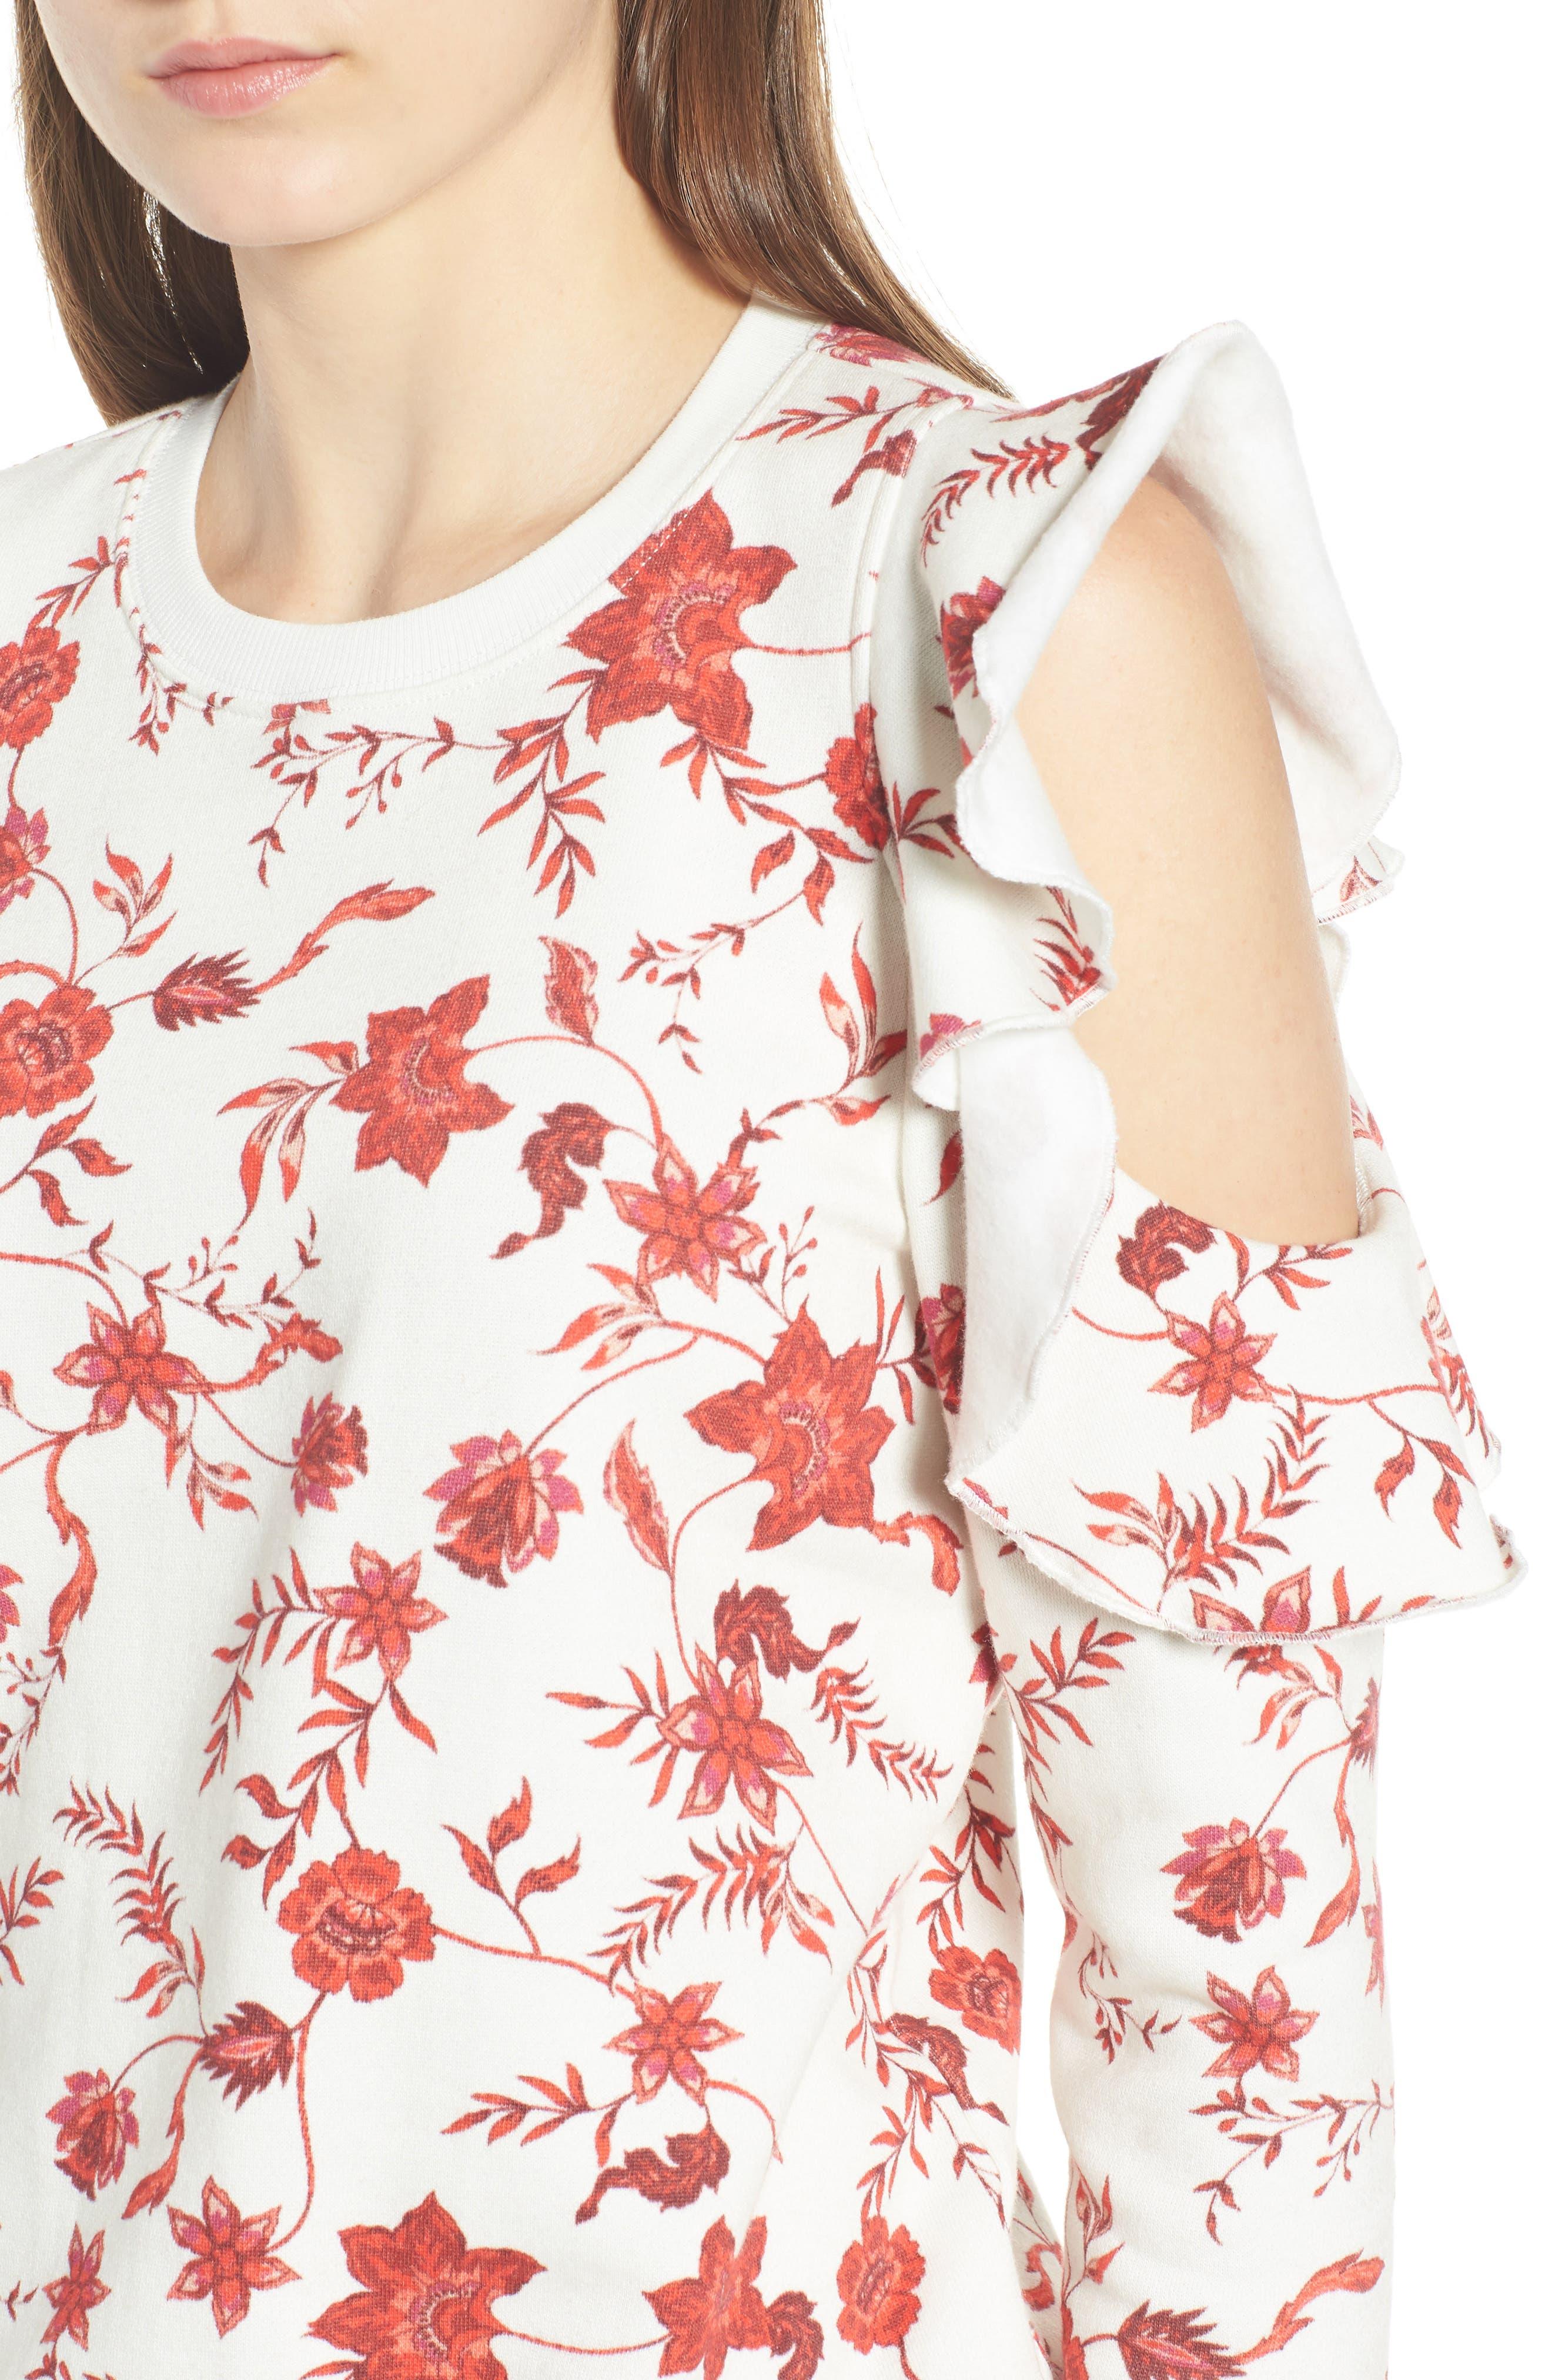 REBECCA MINKOFF,                             Gracie Cold Shoulder Floral Sweatshirt,                             Alternate thumbnail 4, color,                             900